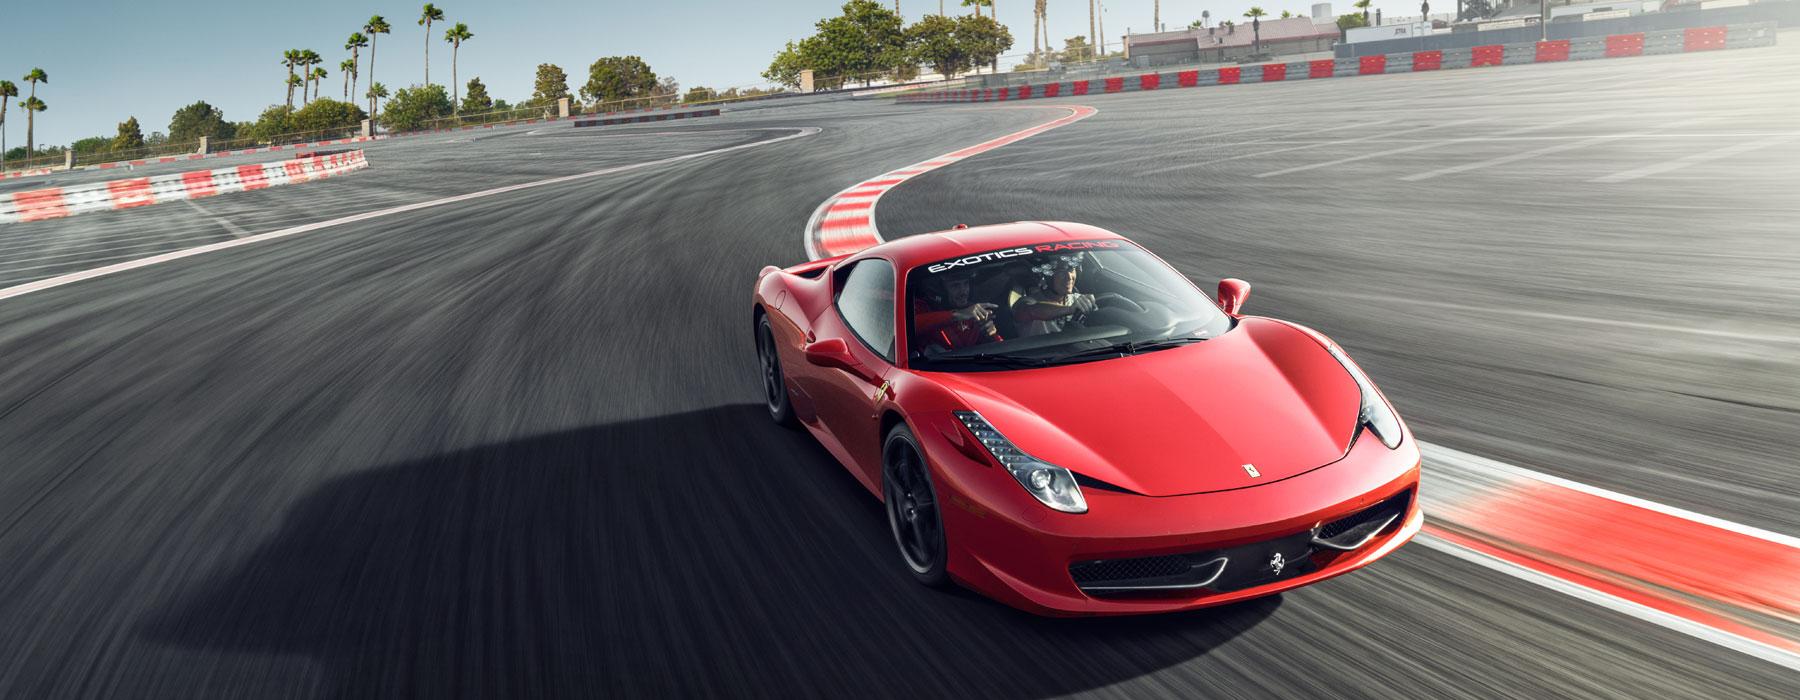 Drive a Ferrari 458 Italia